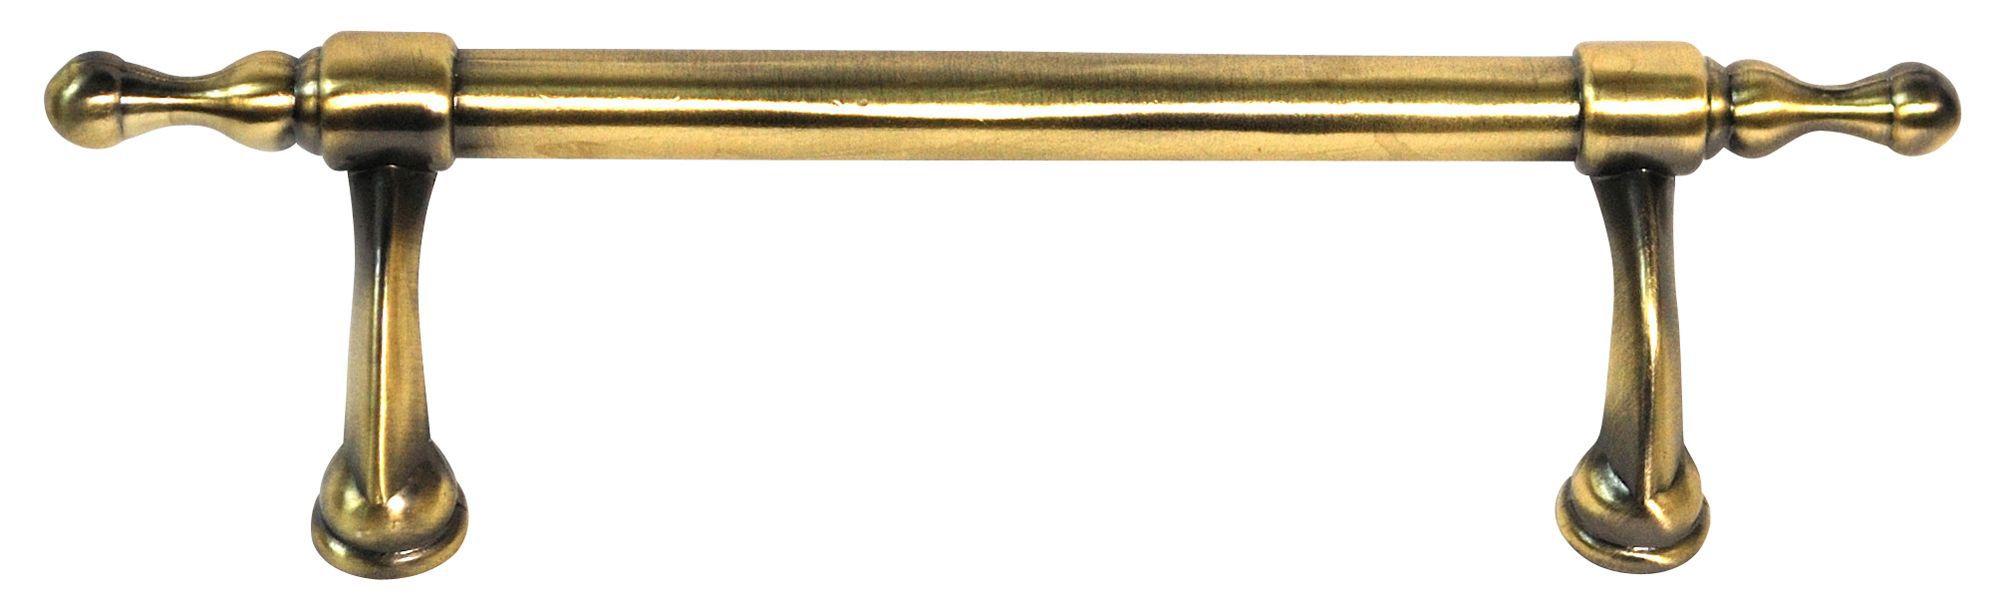 B&q Brass Effect Drop Furniture Handle, Pack Of 1